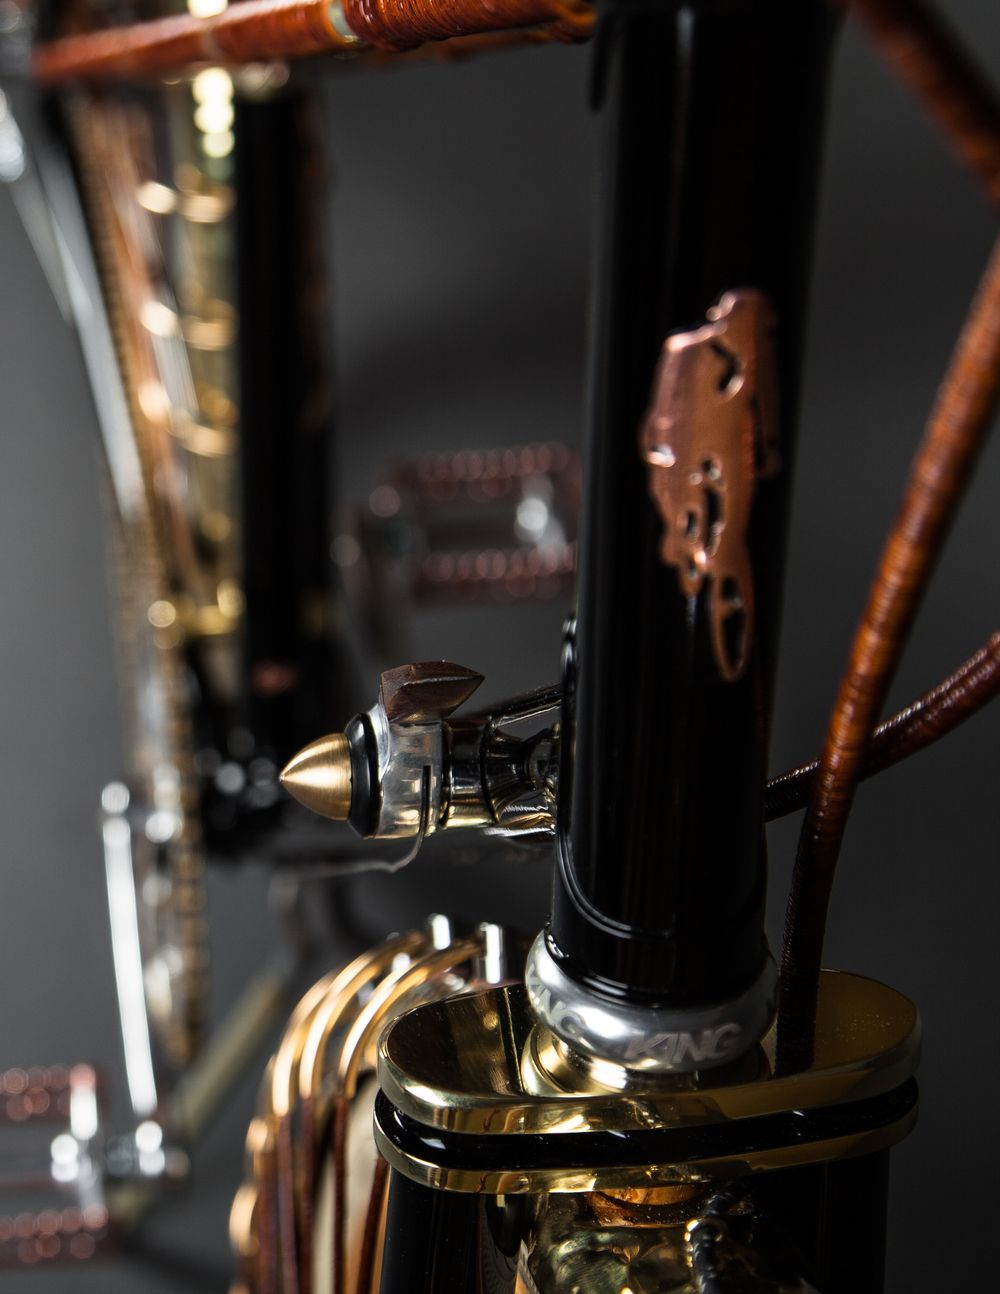 Ascari mixtie custom finals 7 of 60jpg bicicletas